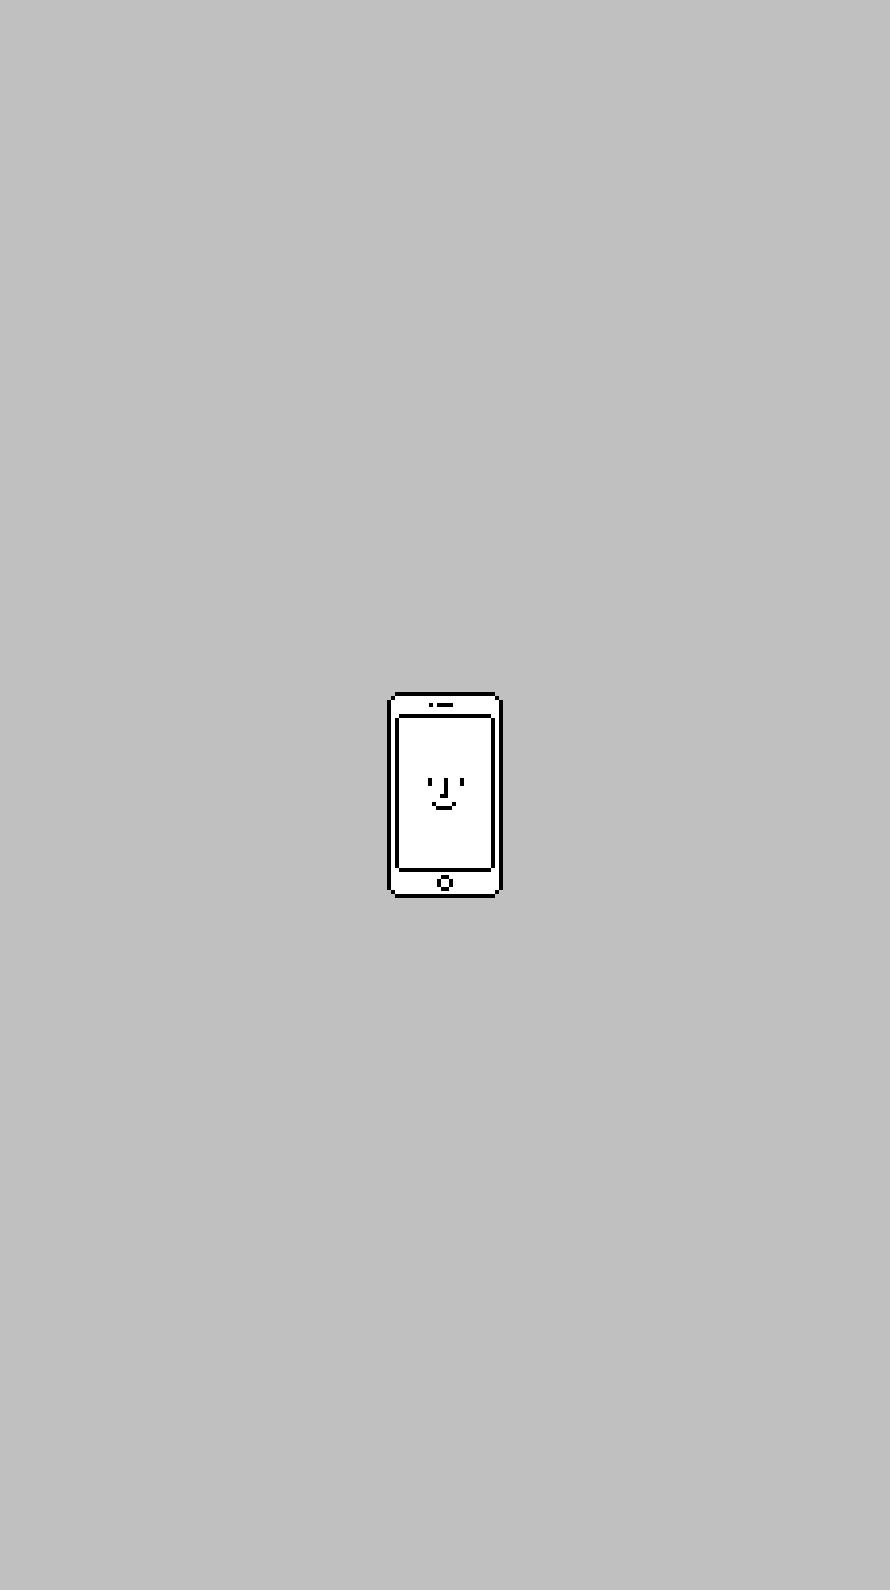 iPhone 6ロック画面用壁紙(視差効果対応版)